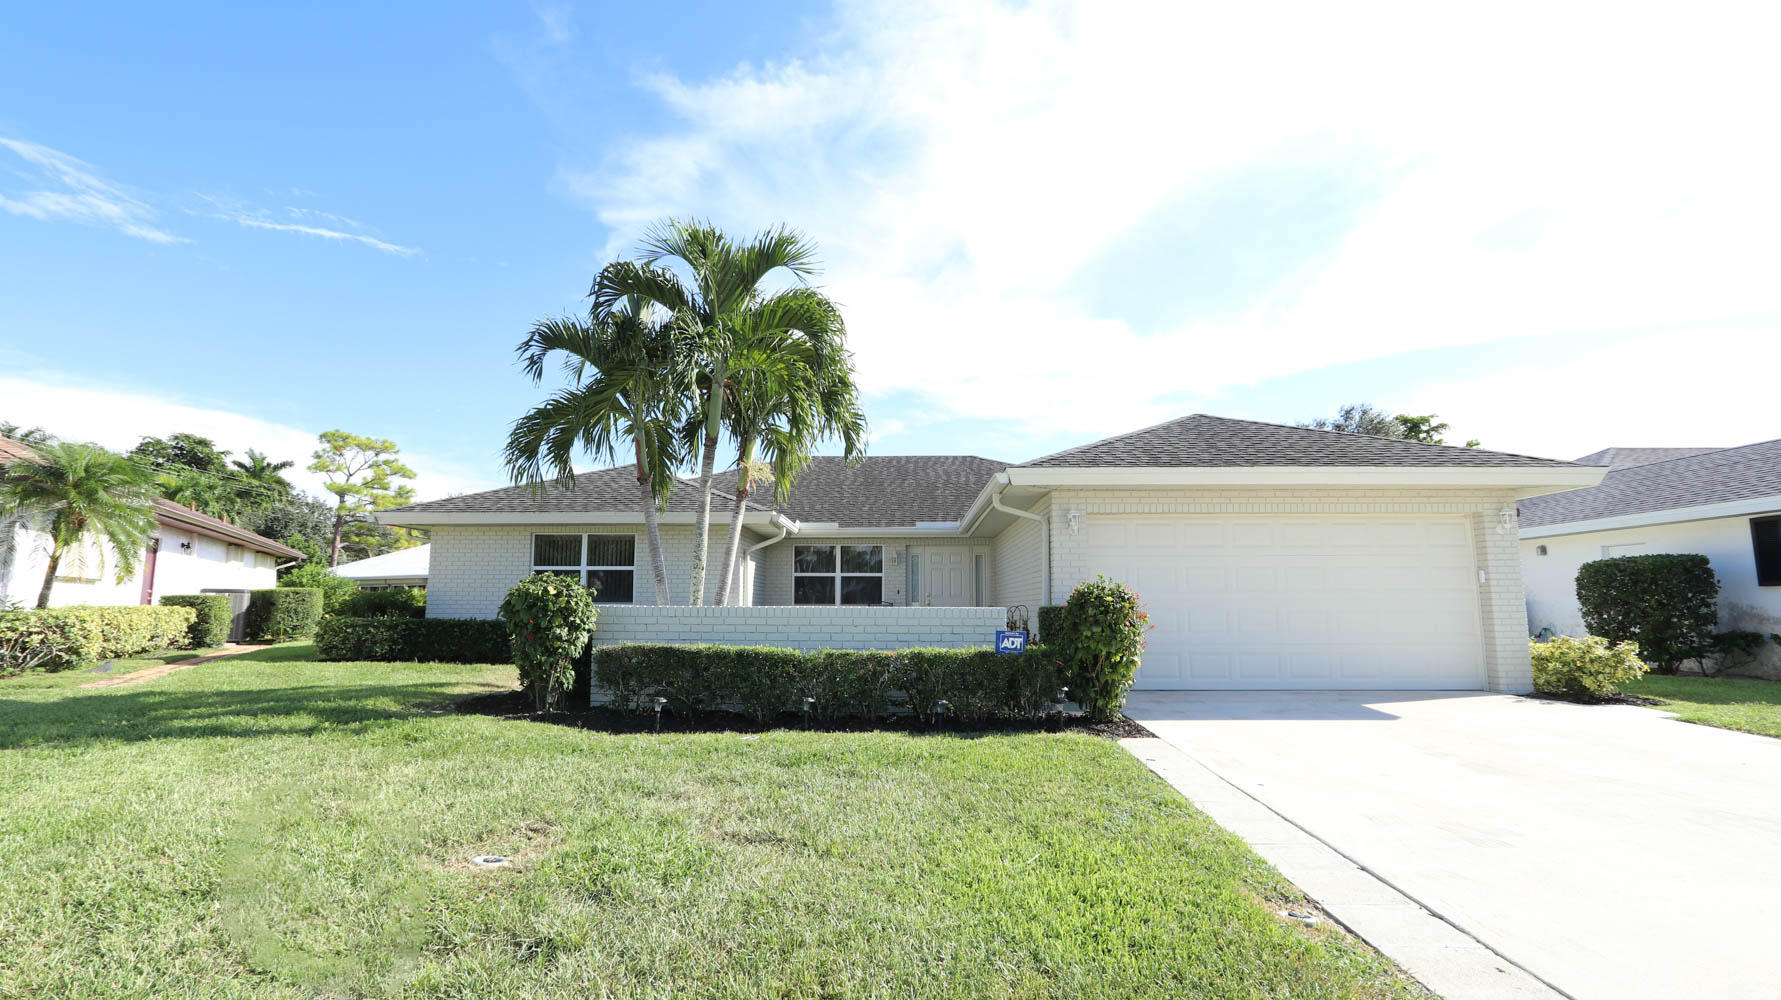 10716 Greentrail S Drive, Boynton Beach, FL 33436